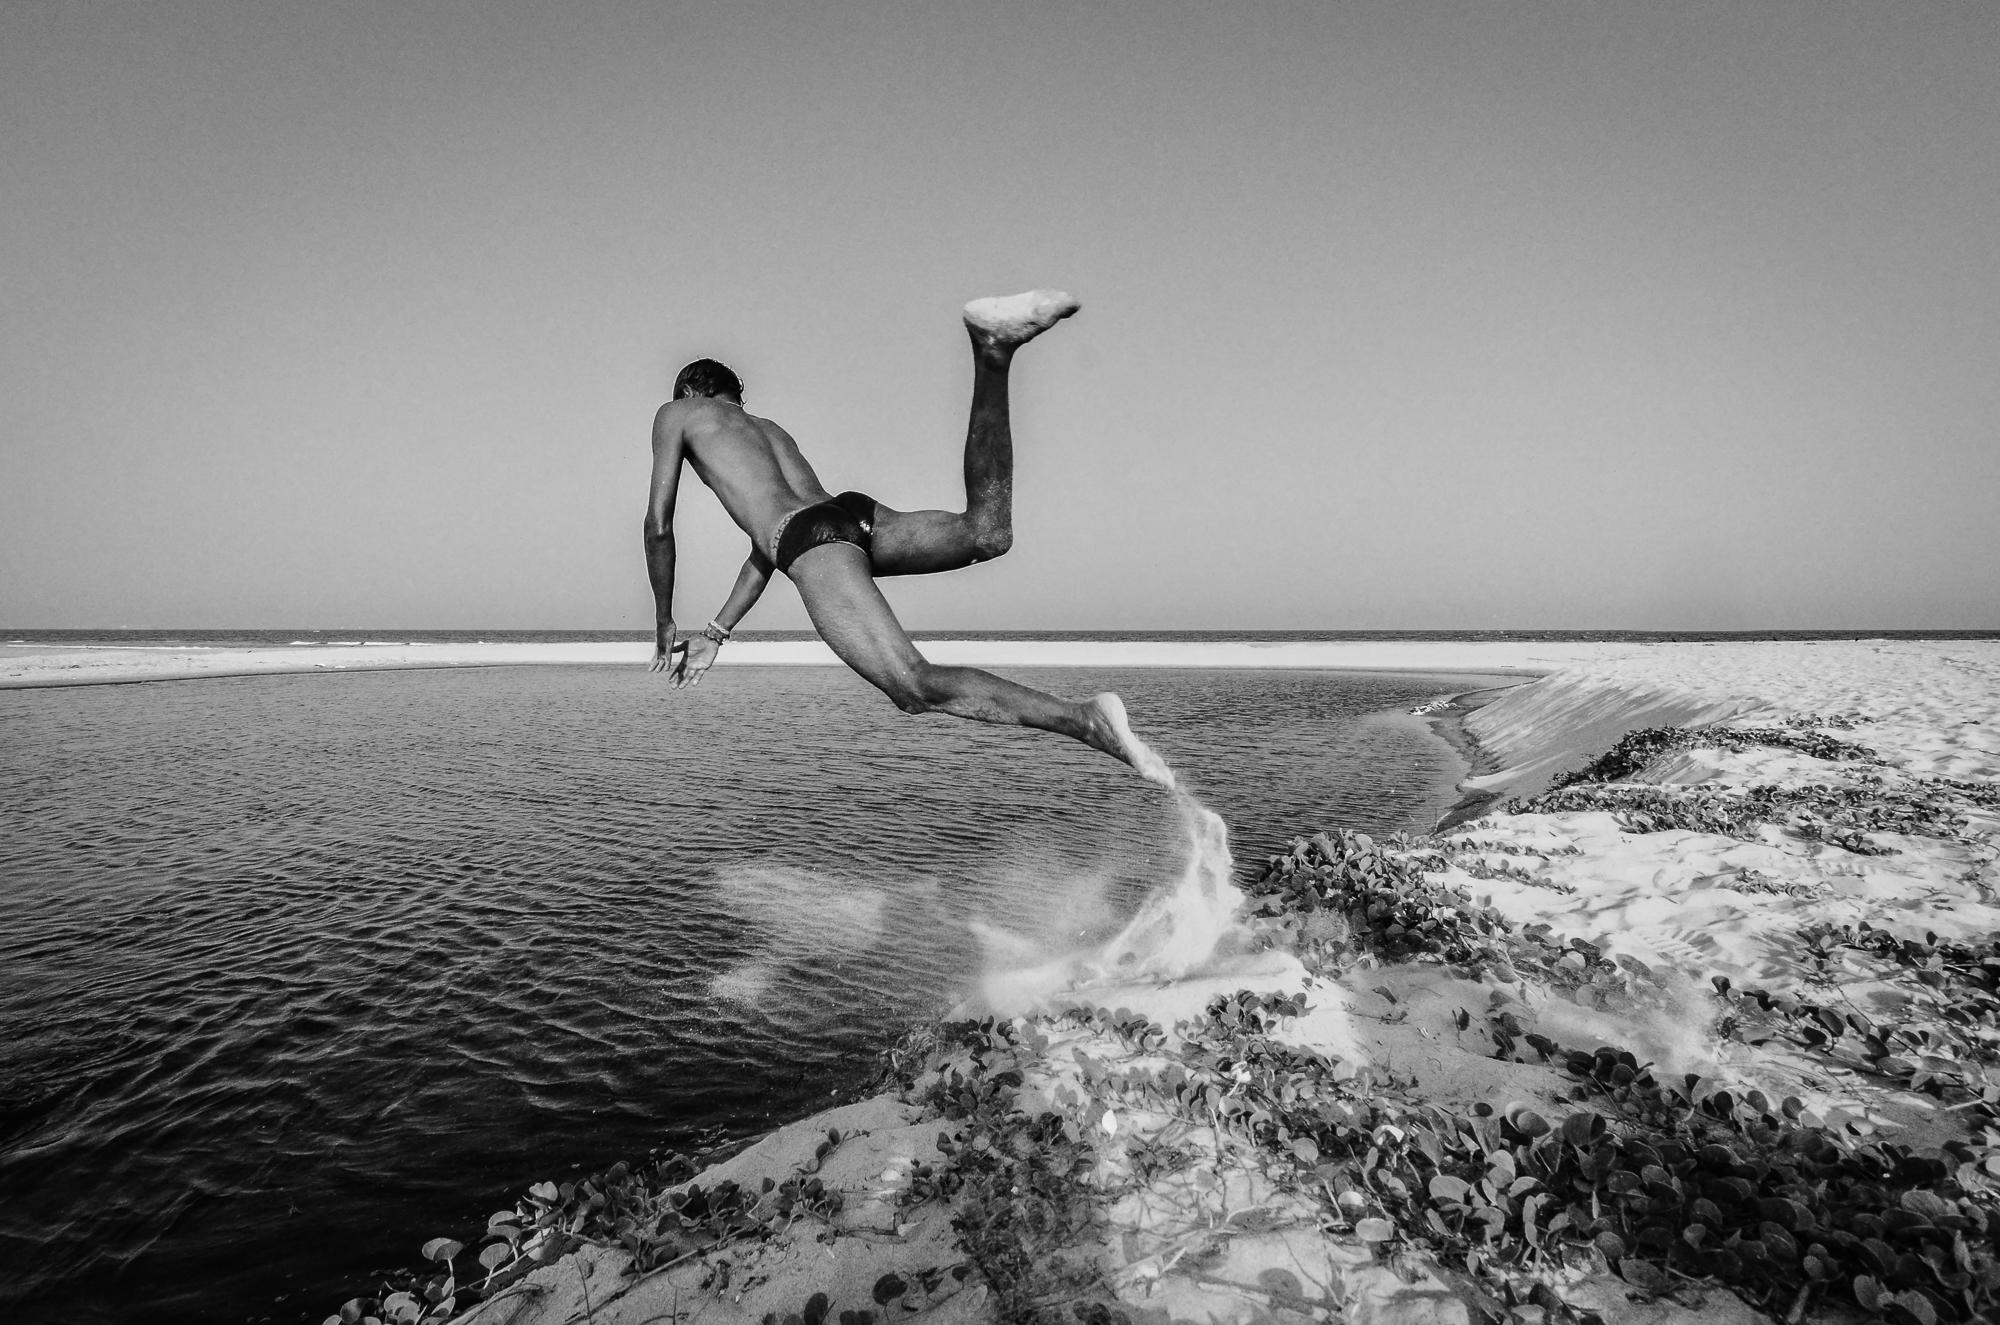 A boy diving on the beach